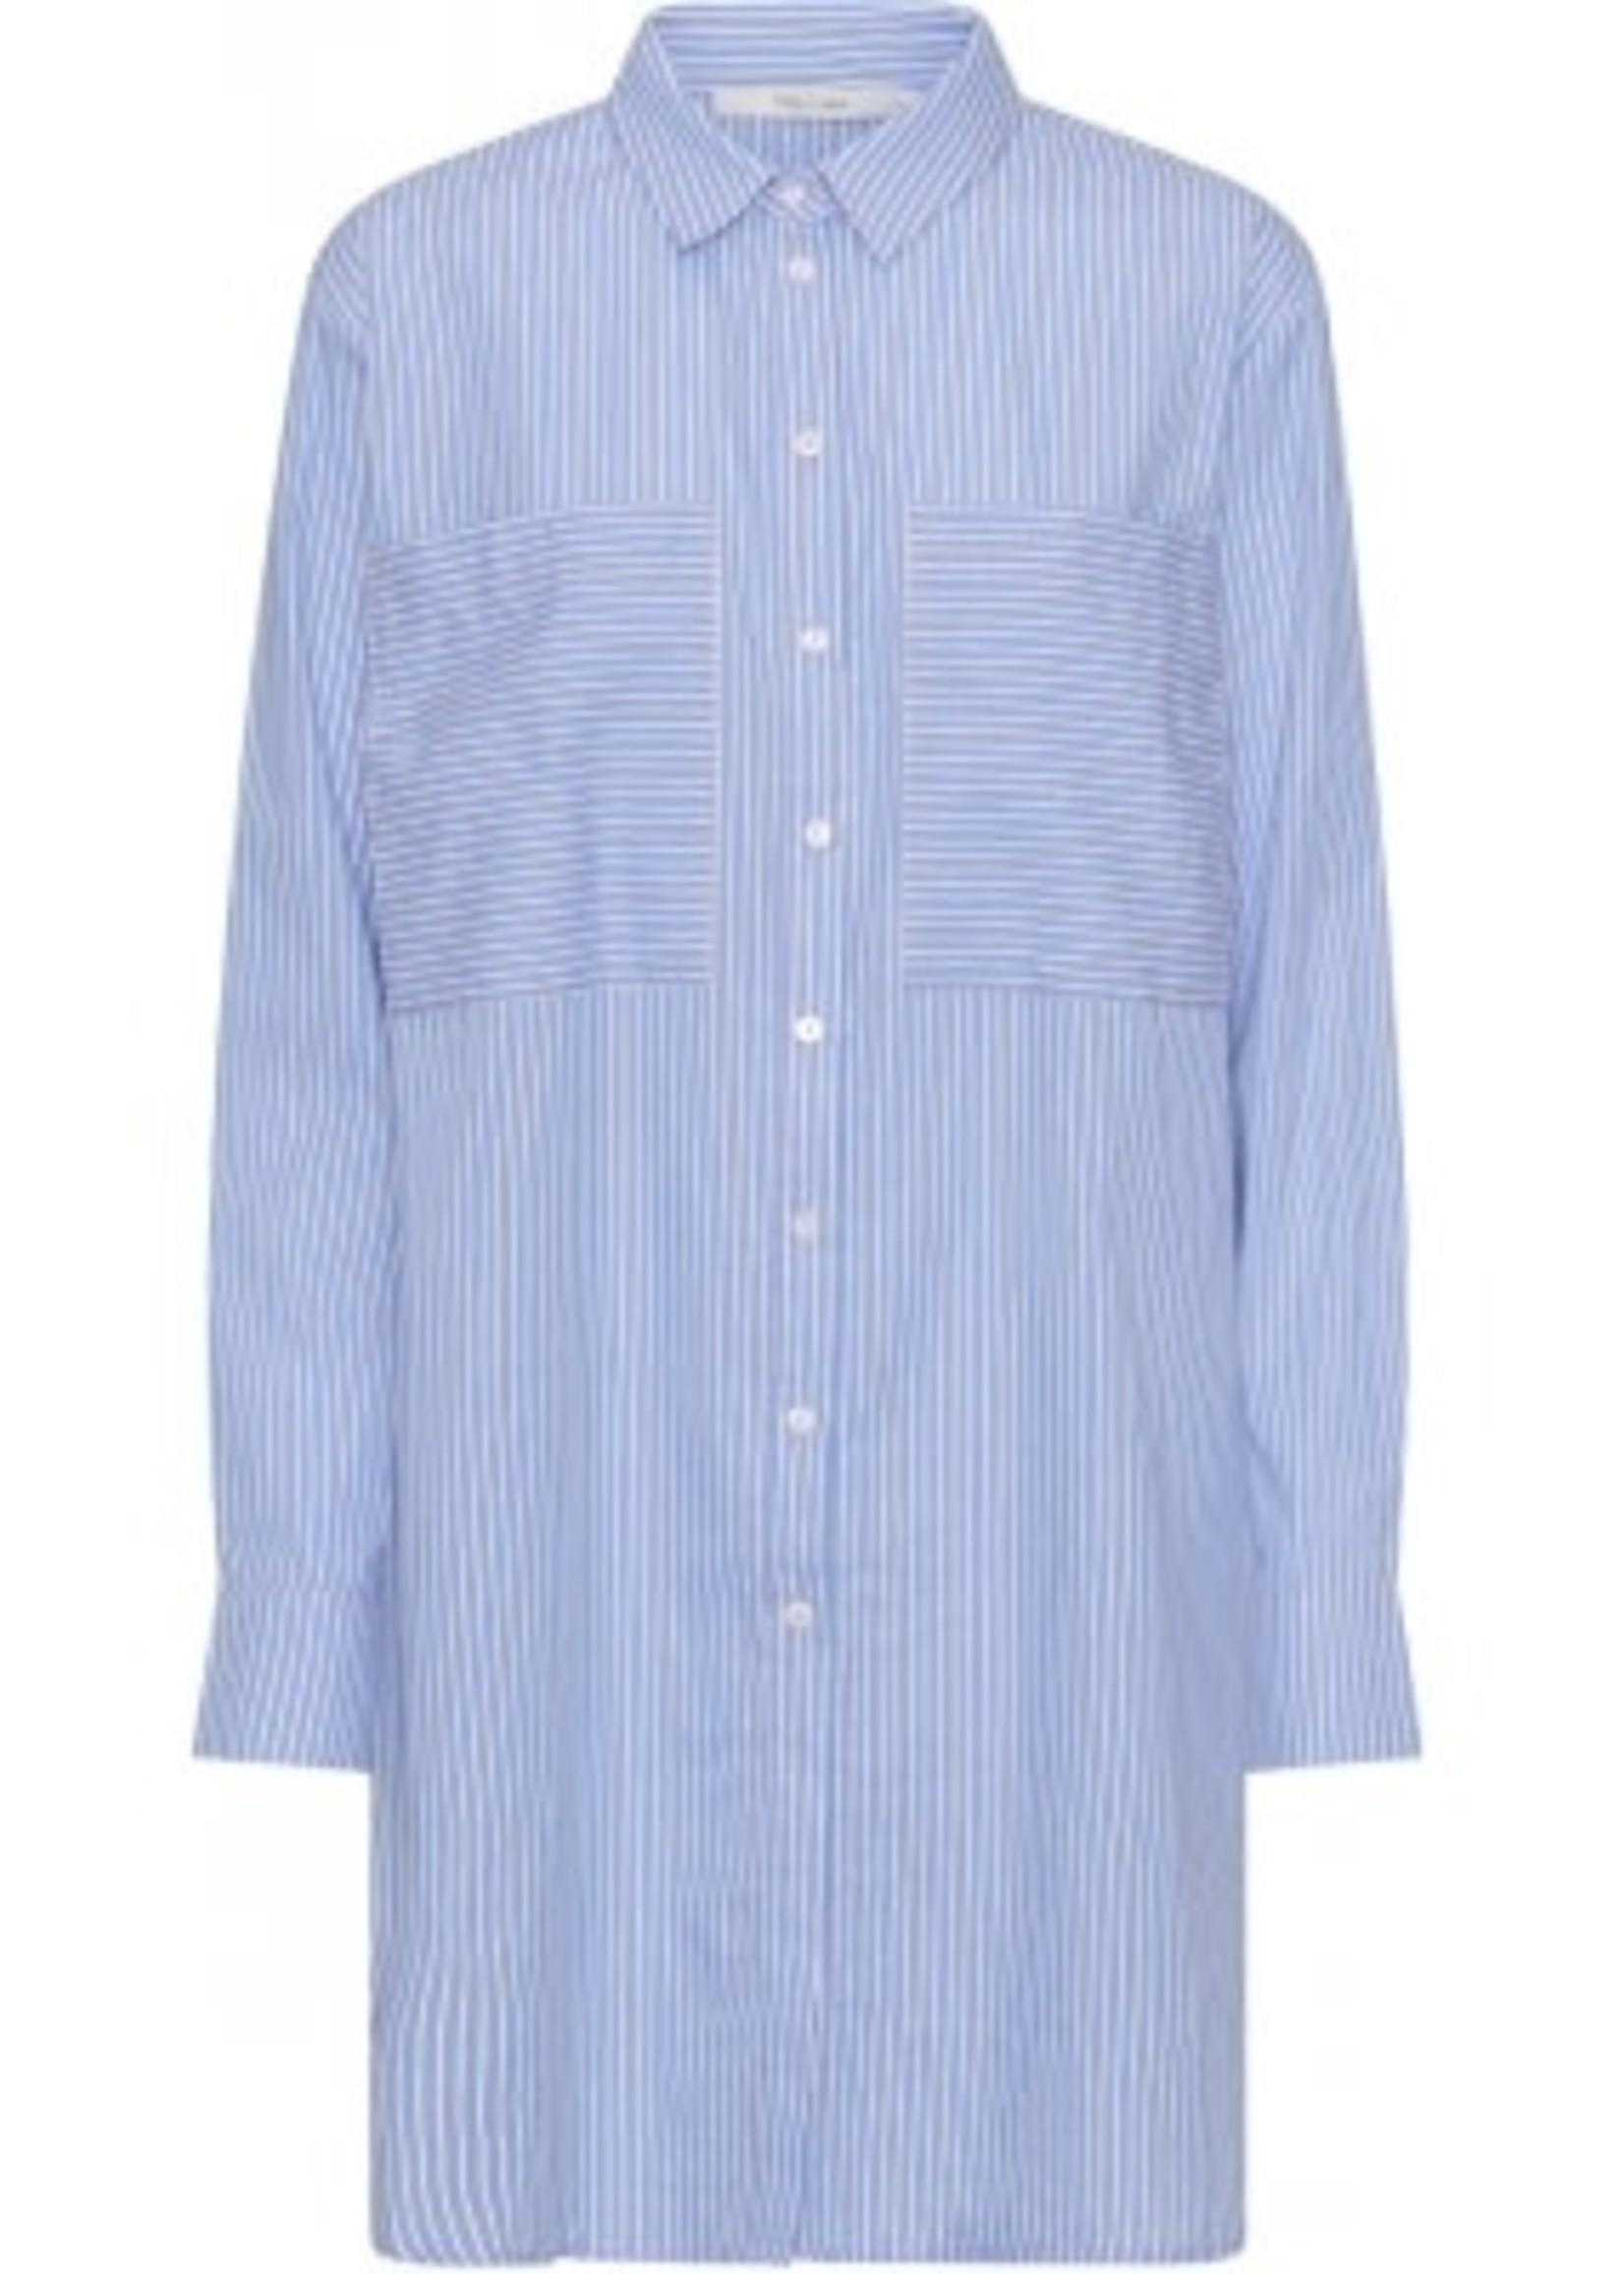 COSTAMANI Beach Stripe long shirt blue